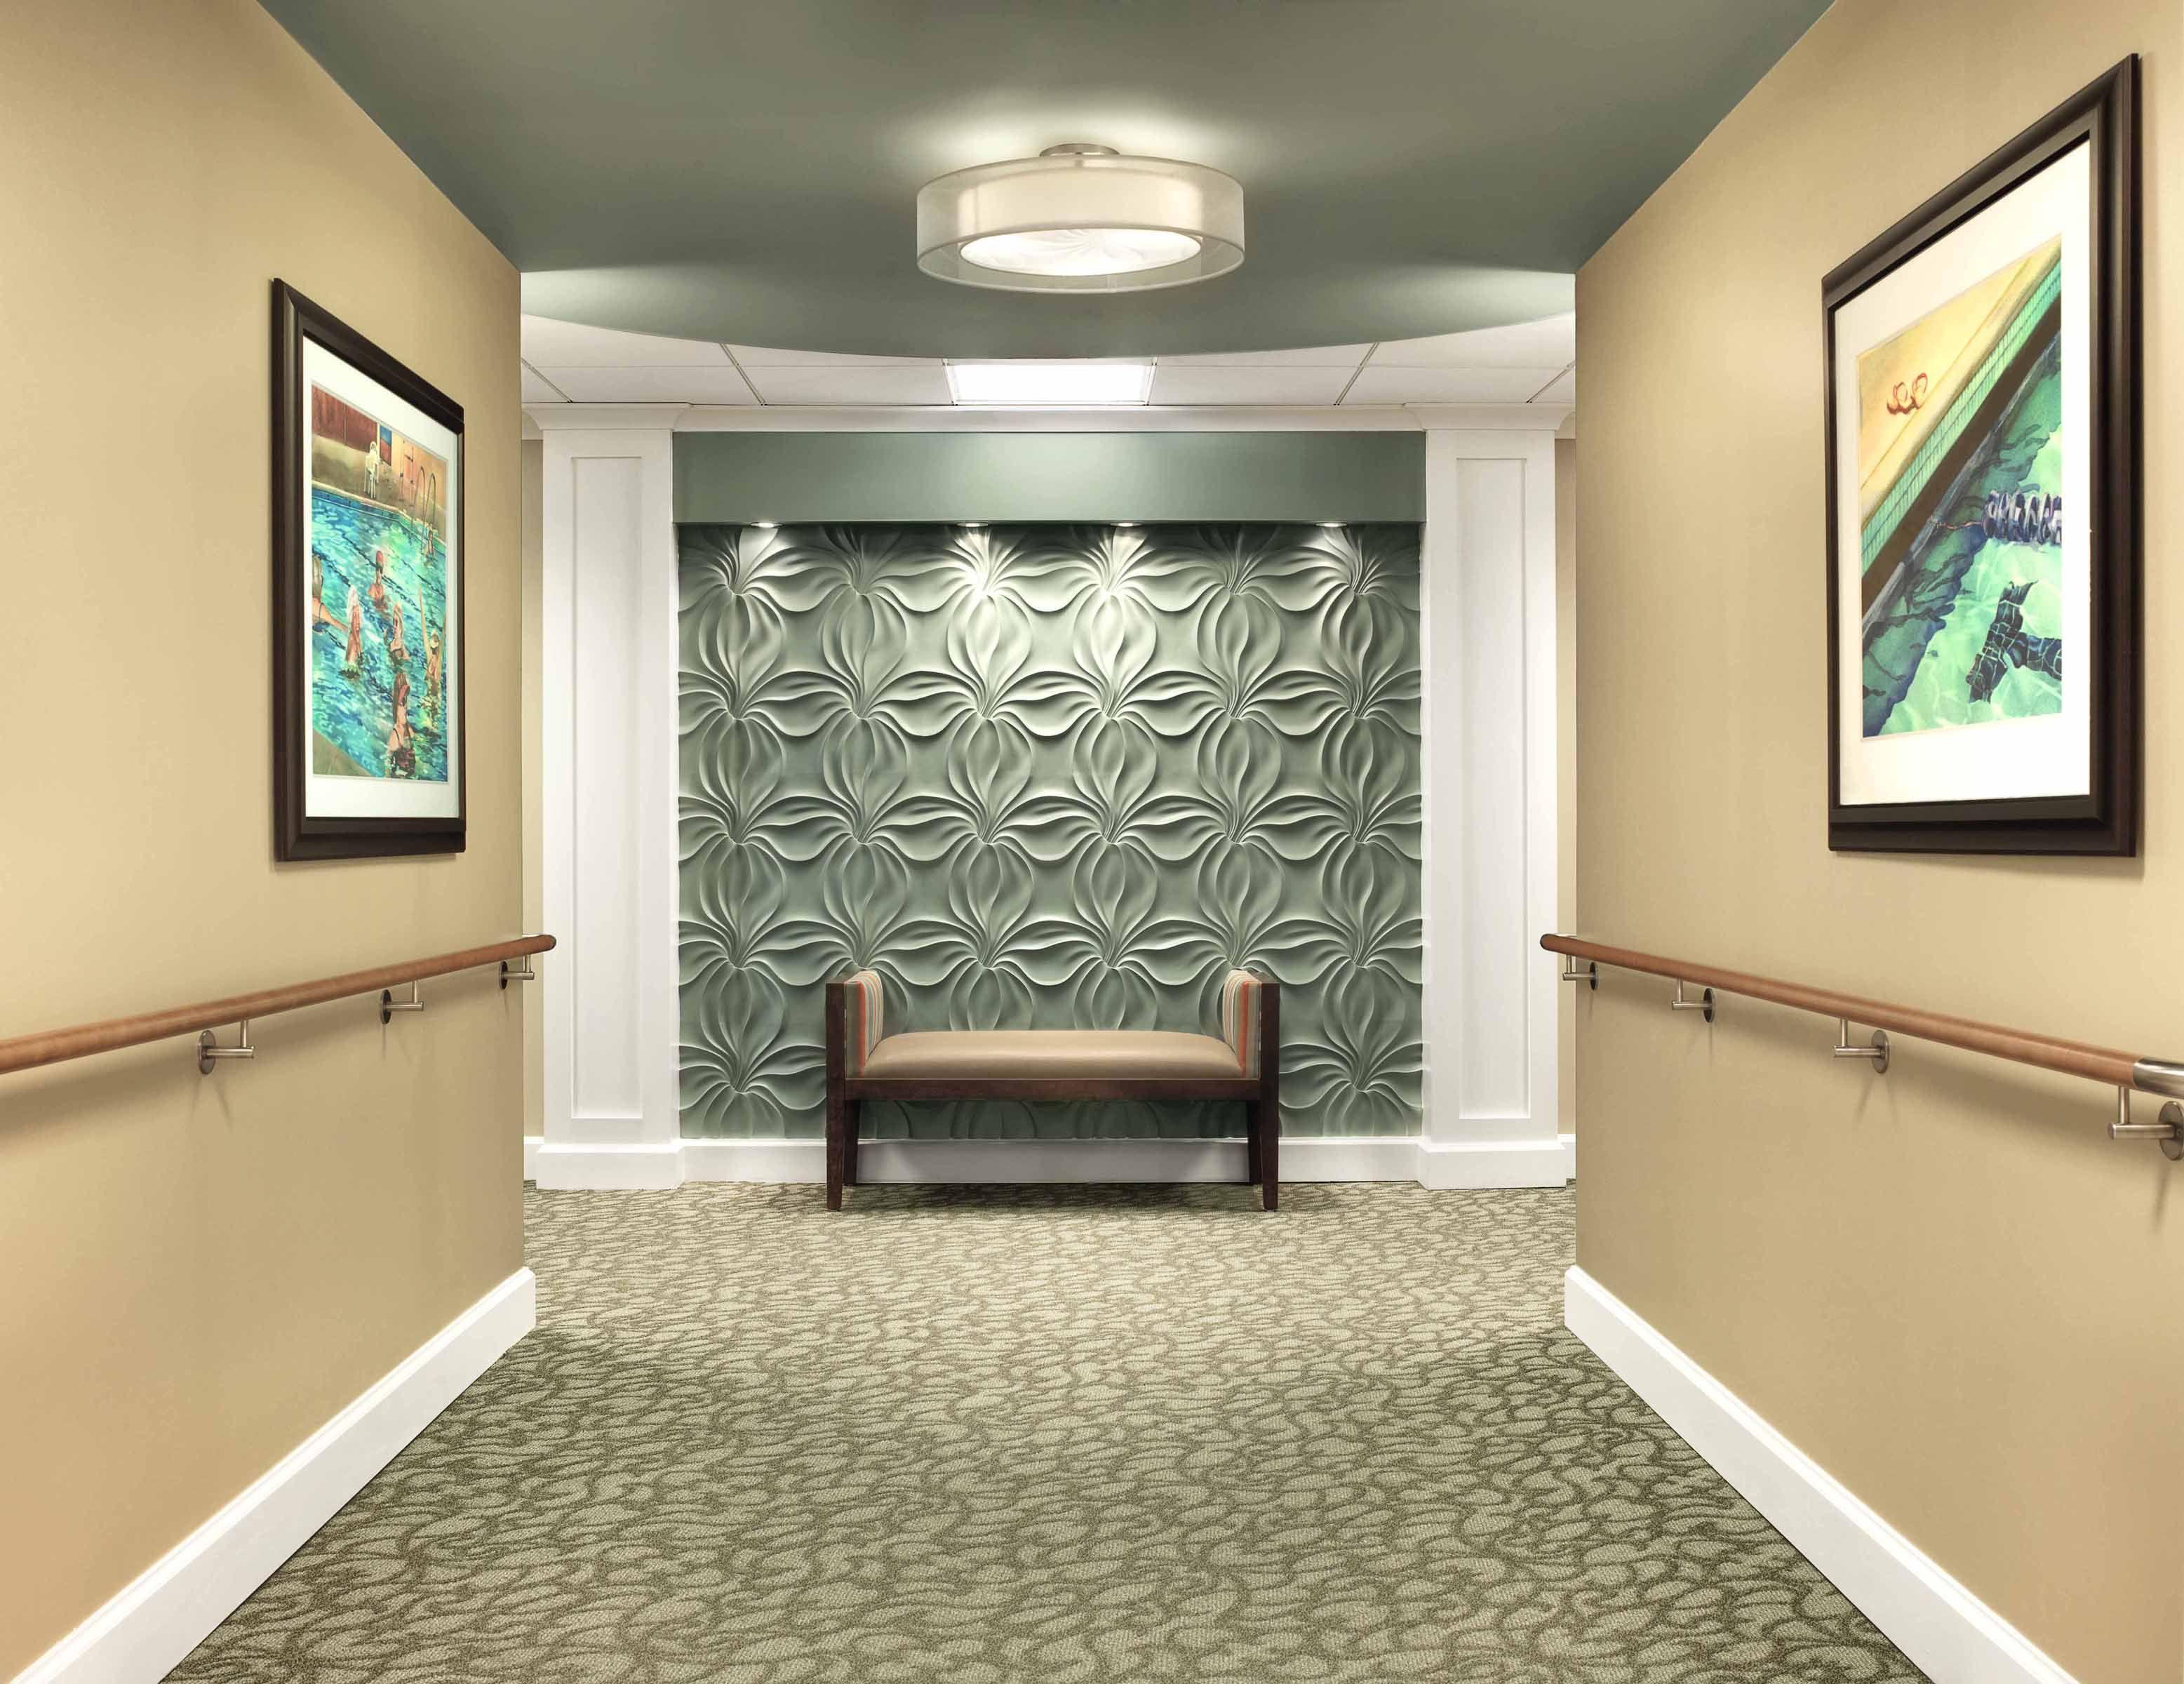 Cypress Glen Corridor Interesting End Of Corridor Lighting Texture Wall Senior Living